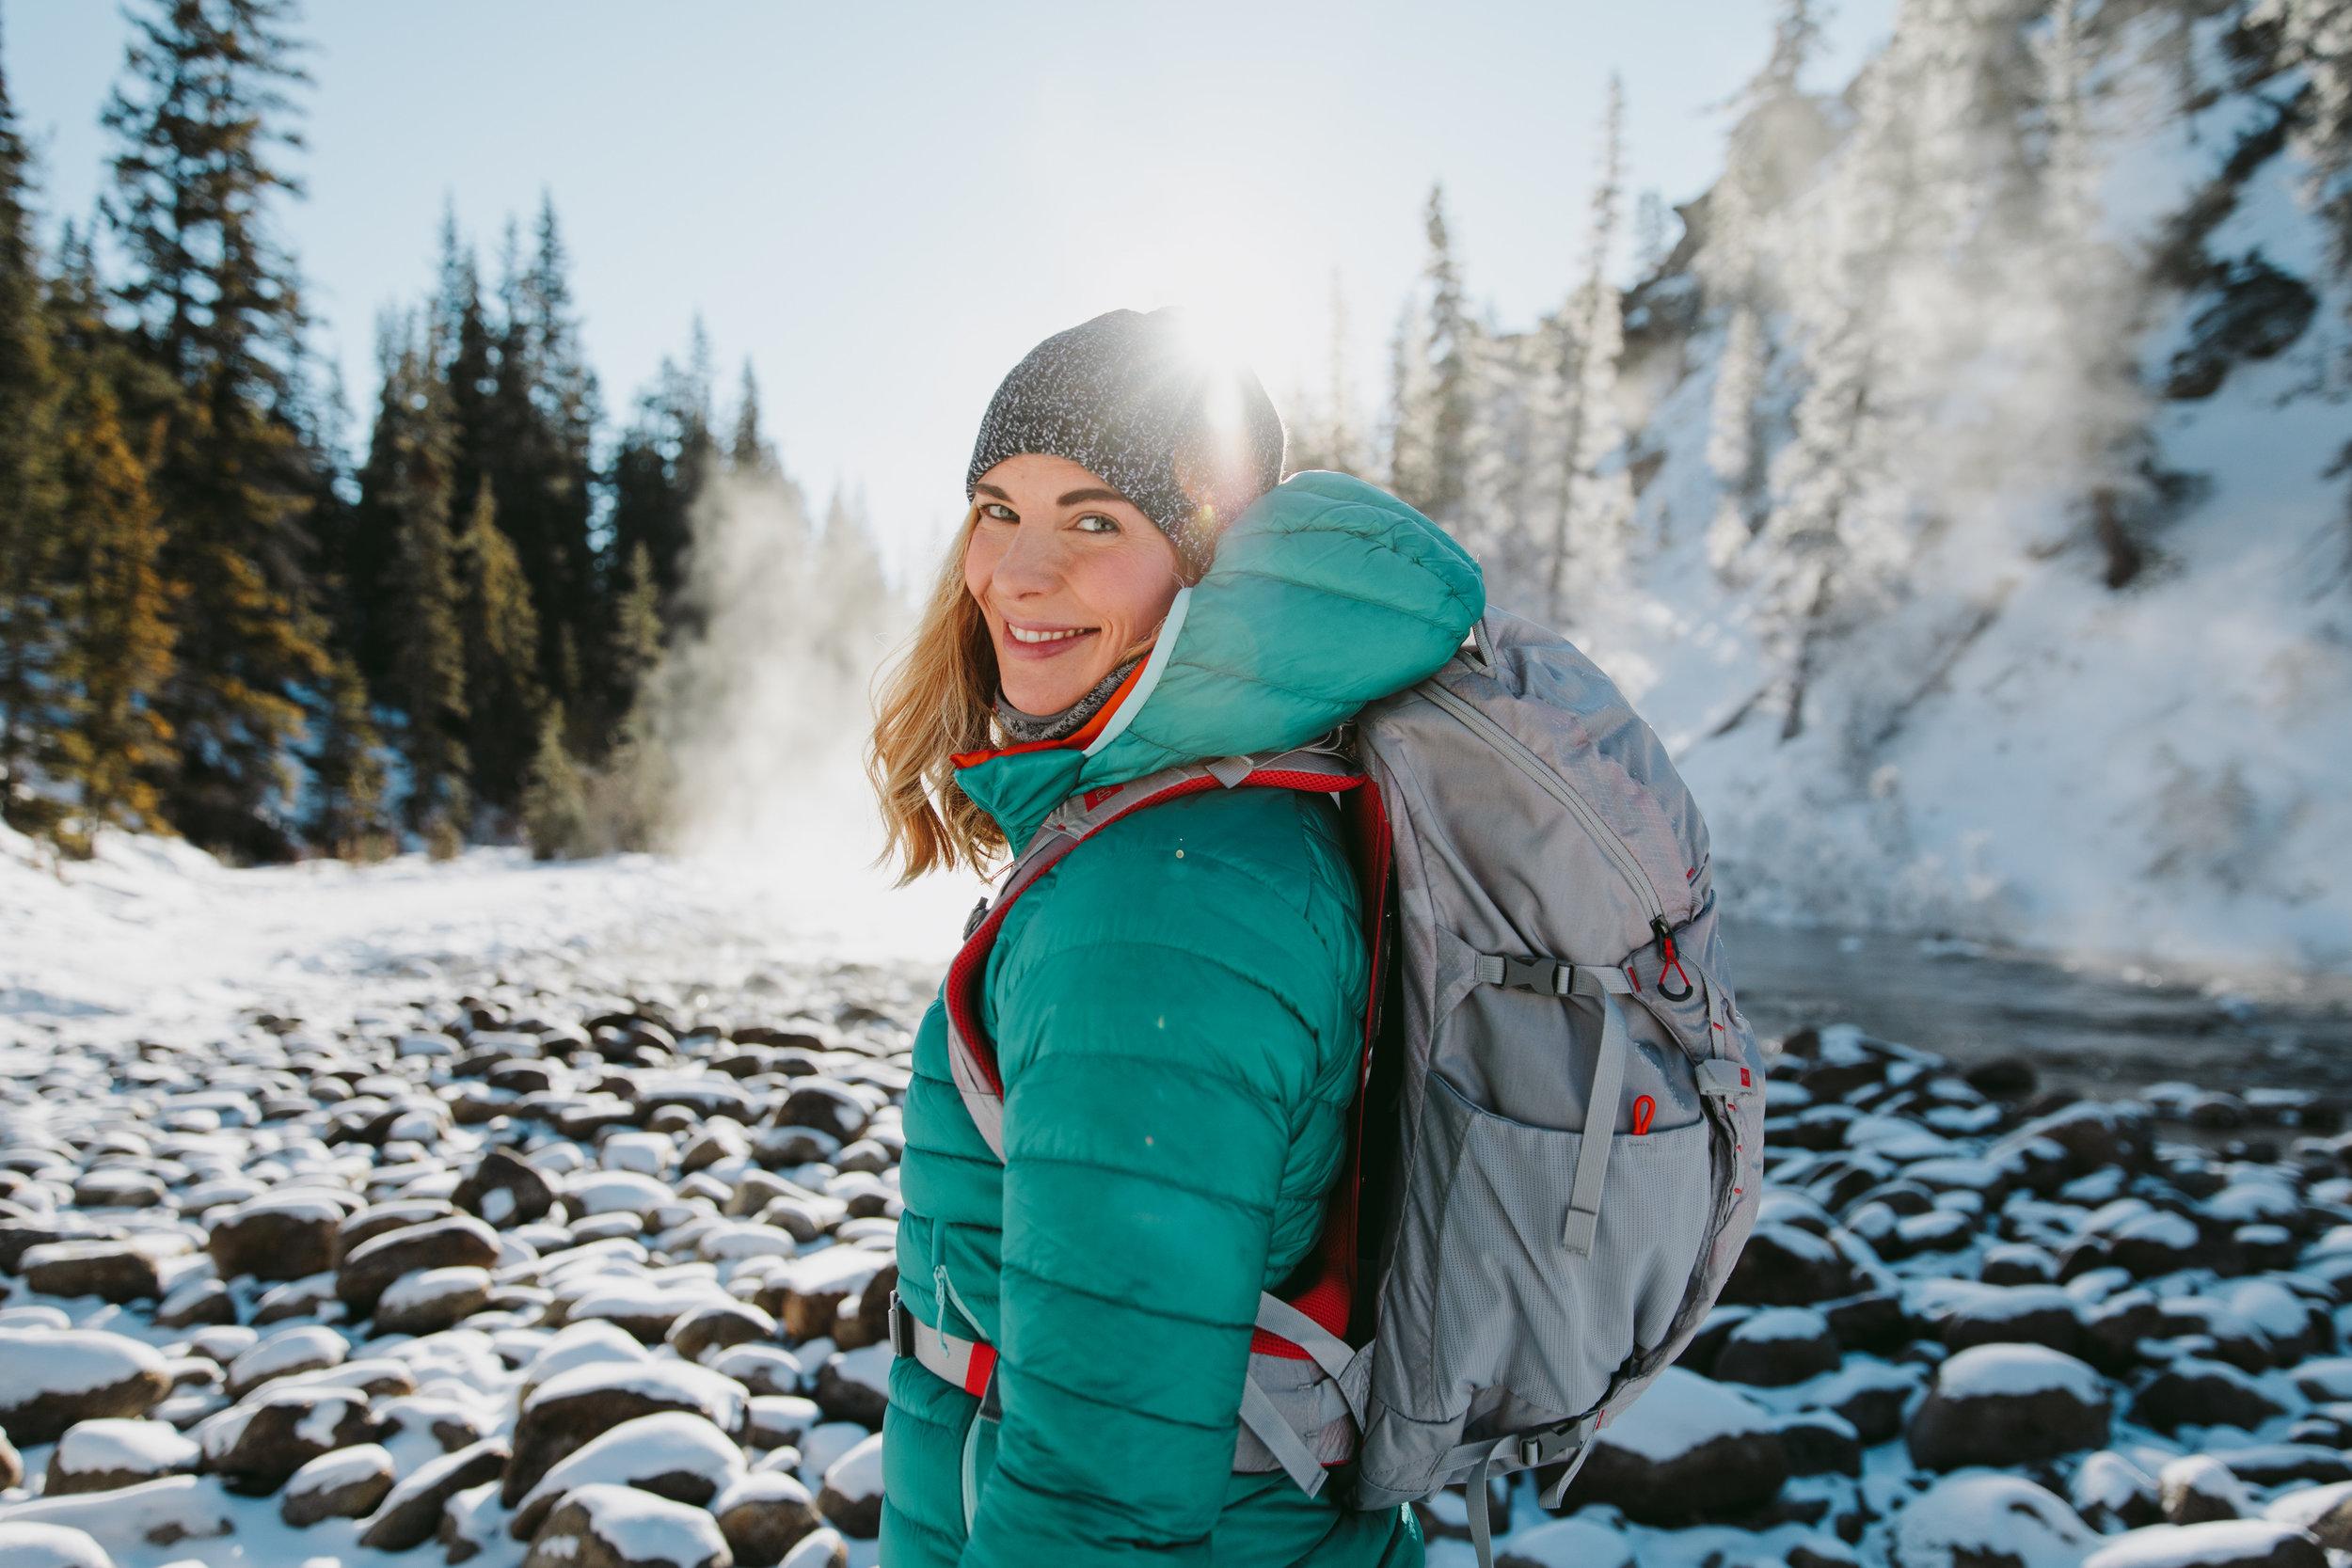 MikeSeehagel-TravelAlberta-Ready-Rebrand_Canada-LifestylePhotography_12.jpg